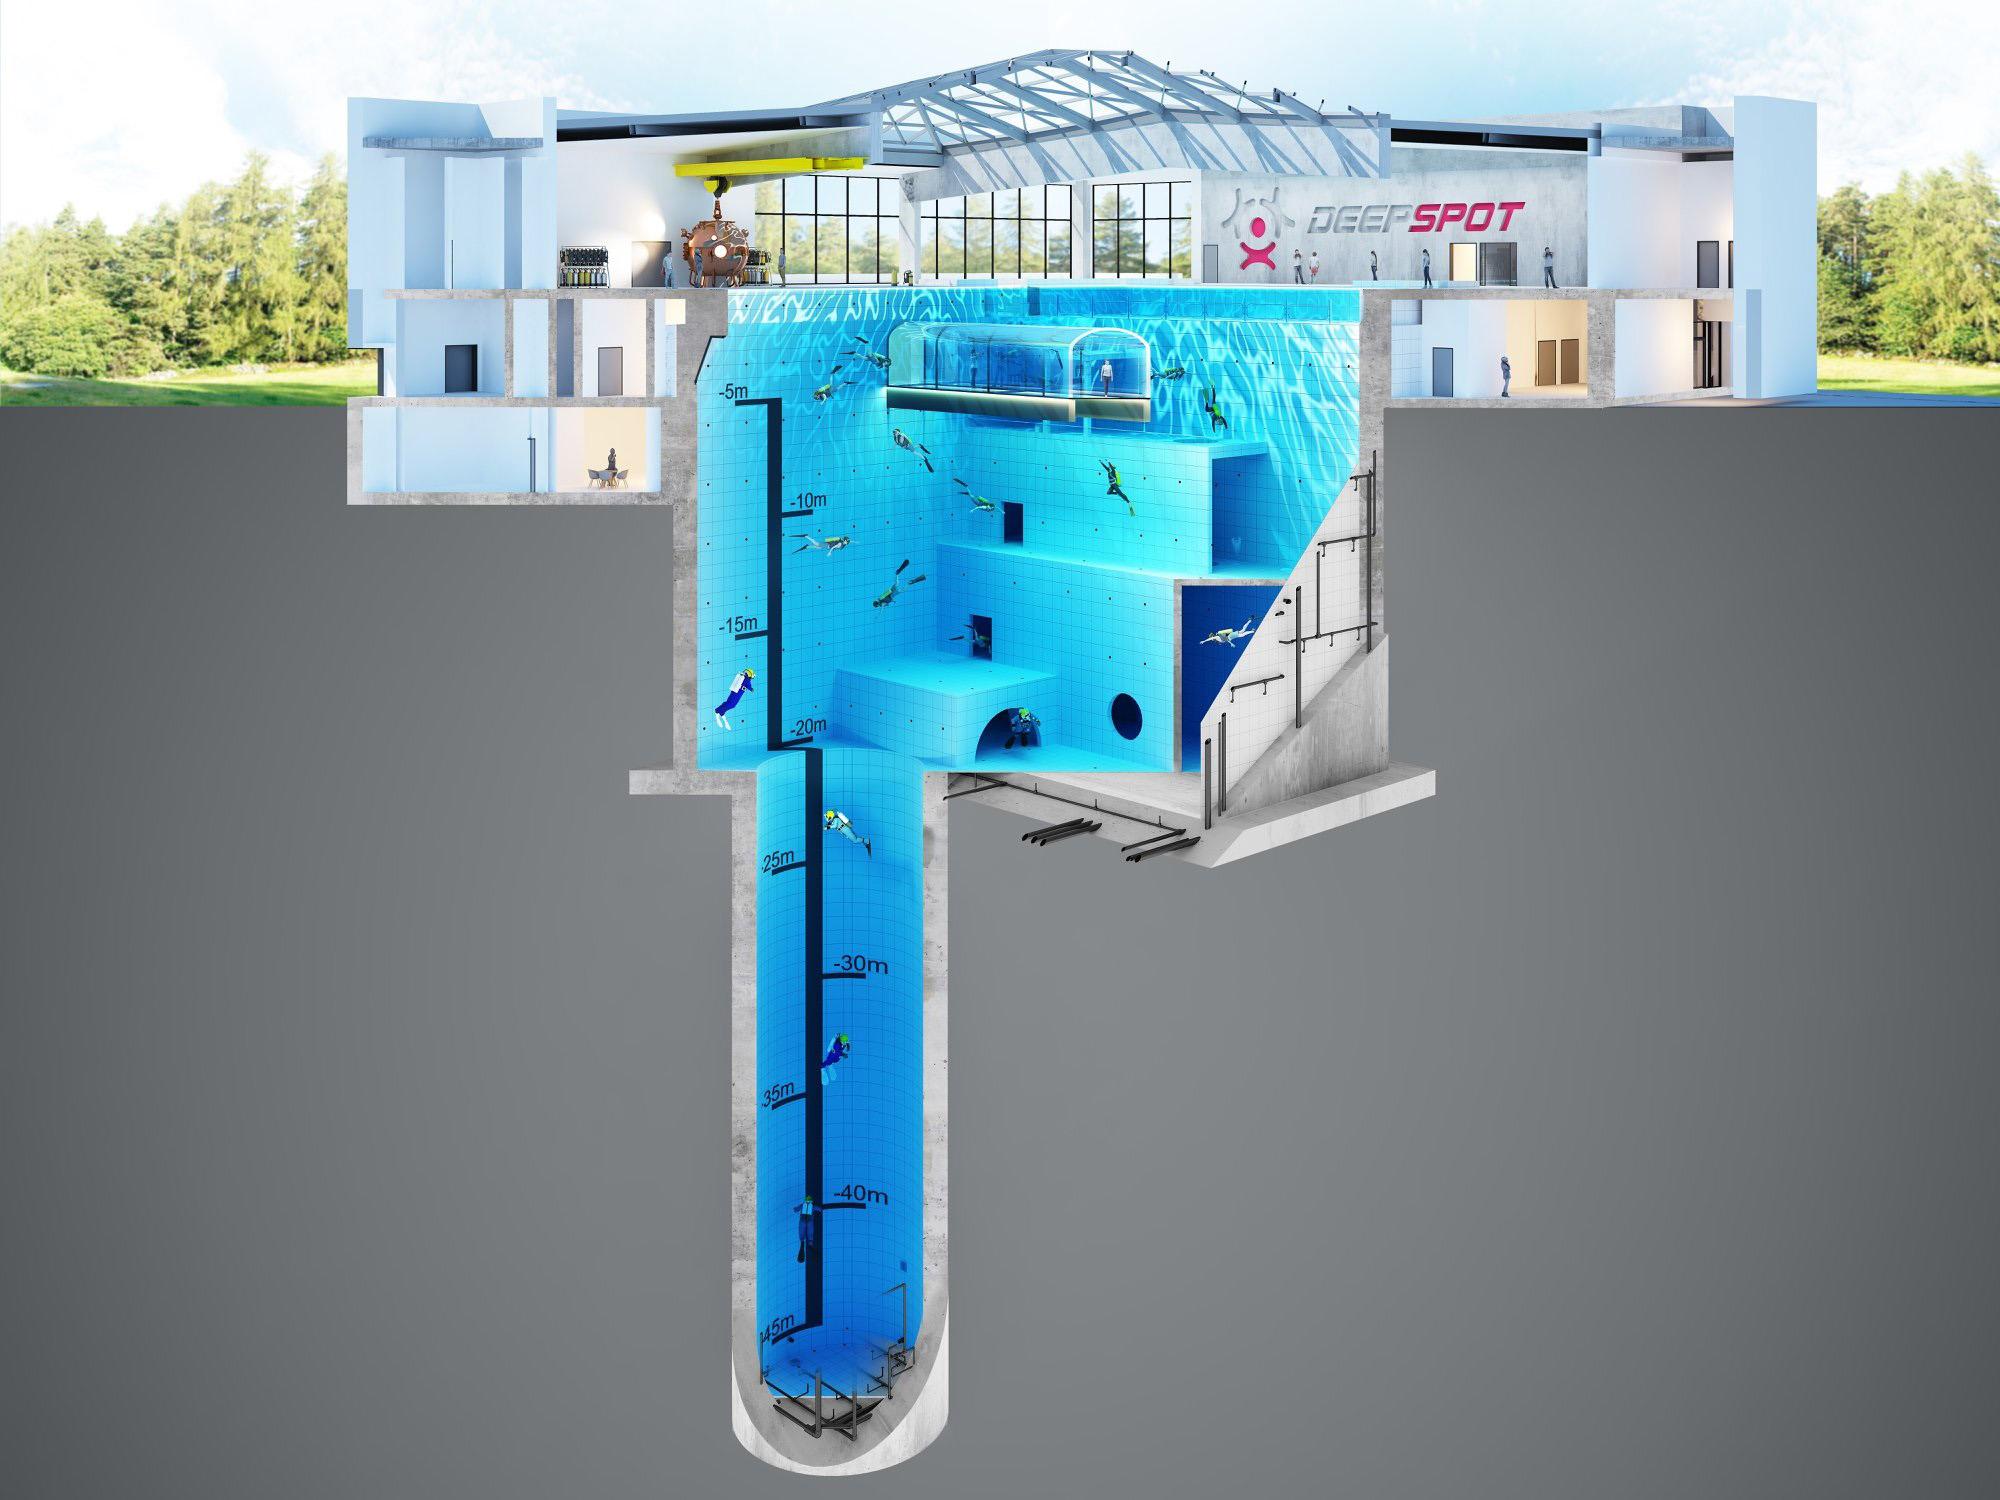 The pool will be 45 metres (148 feet) deep. Credit: CEN/@deepspotpoland